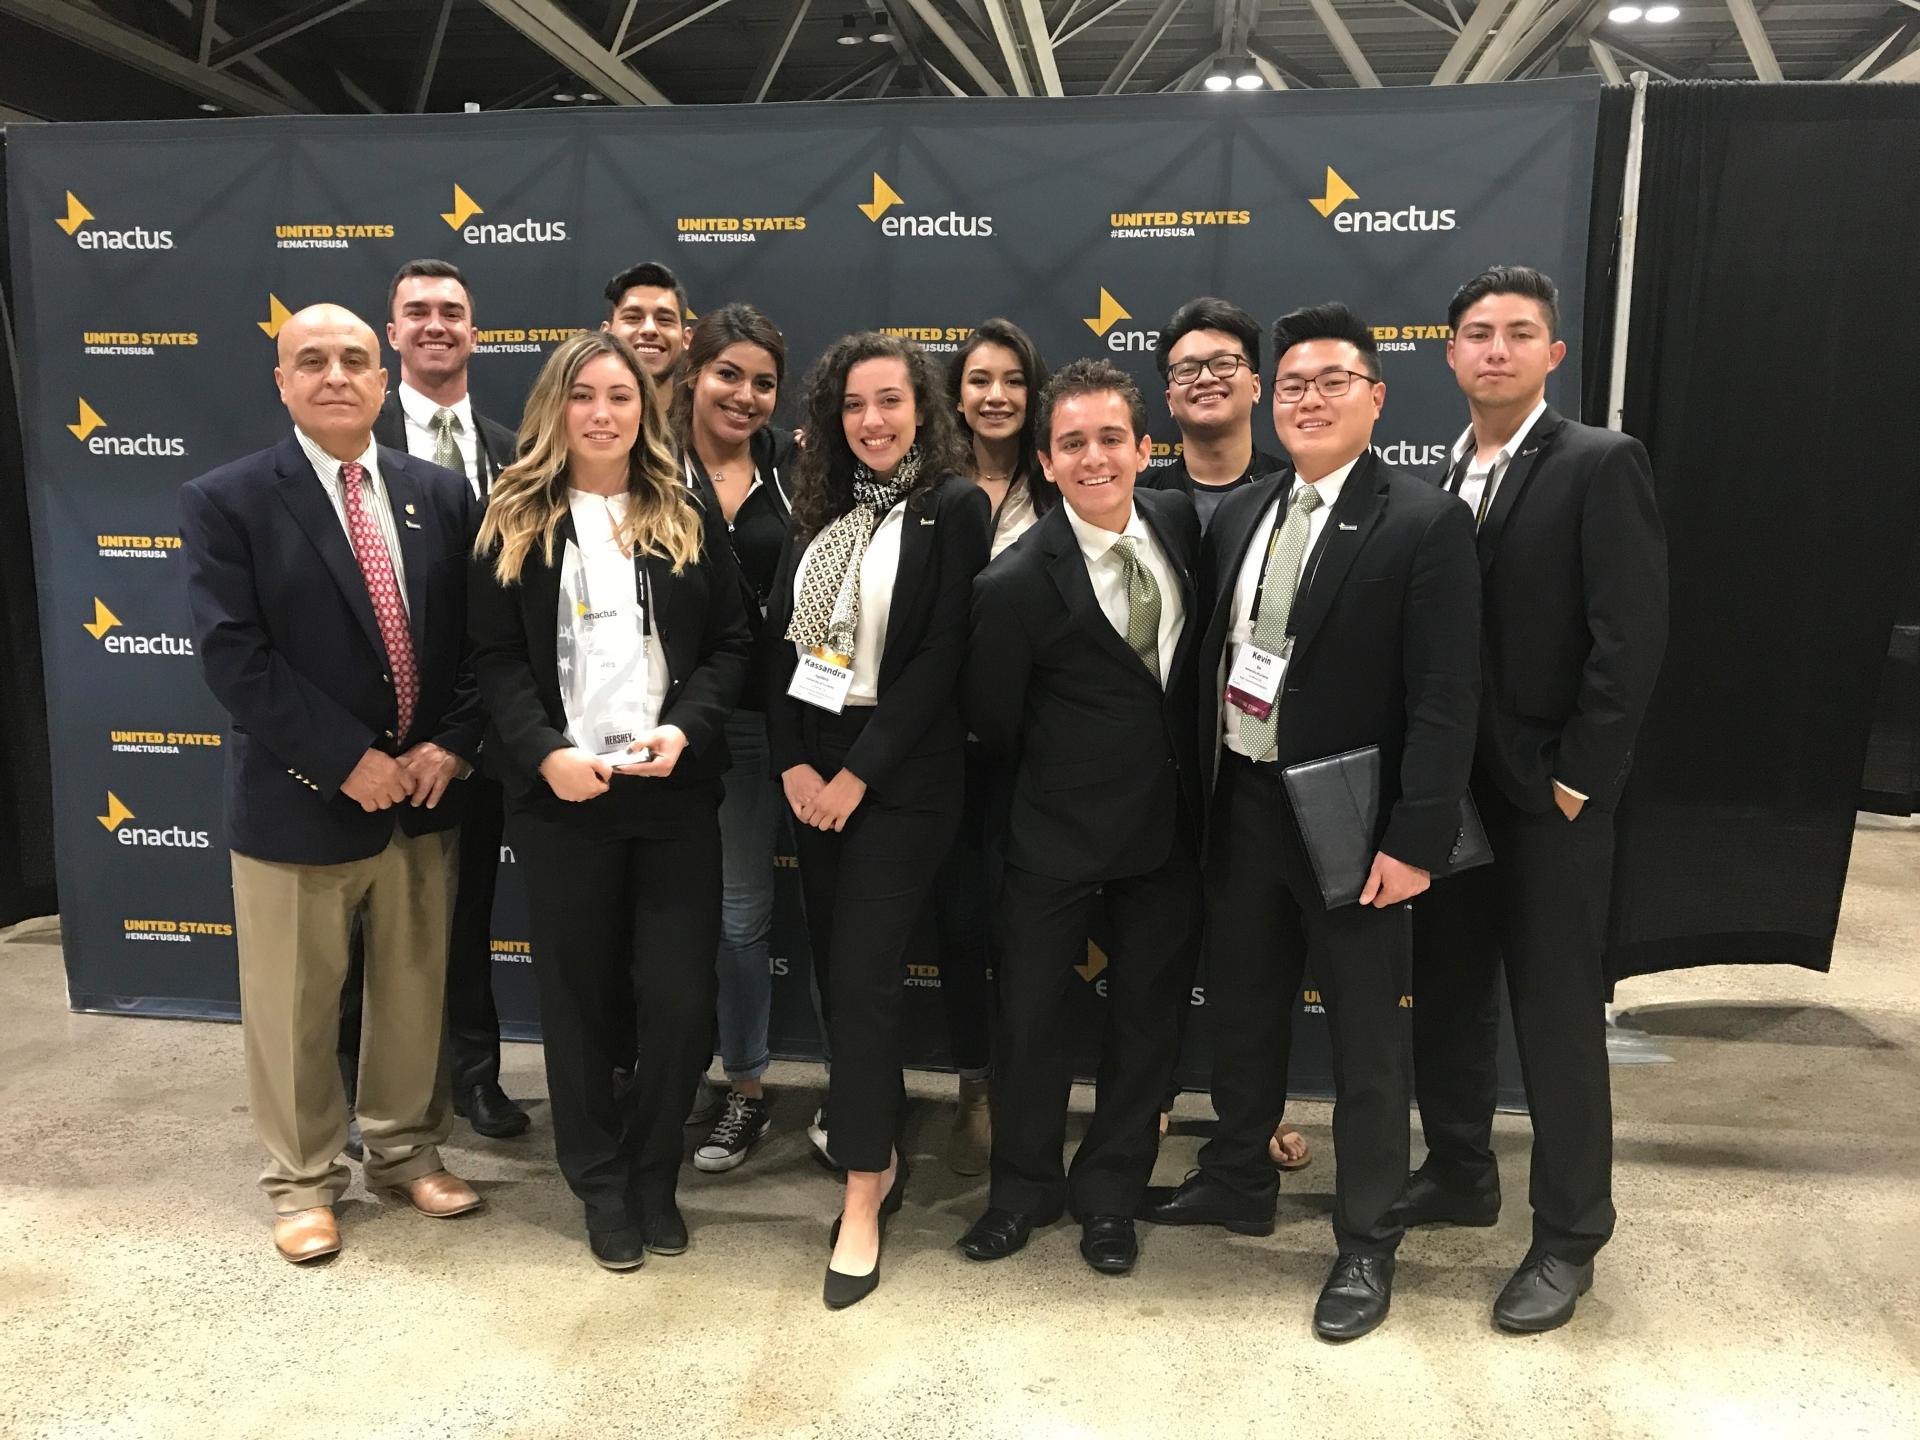 University of La Verne Enactus team.